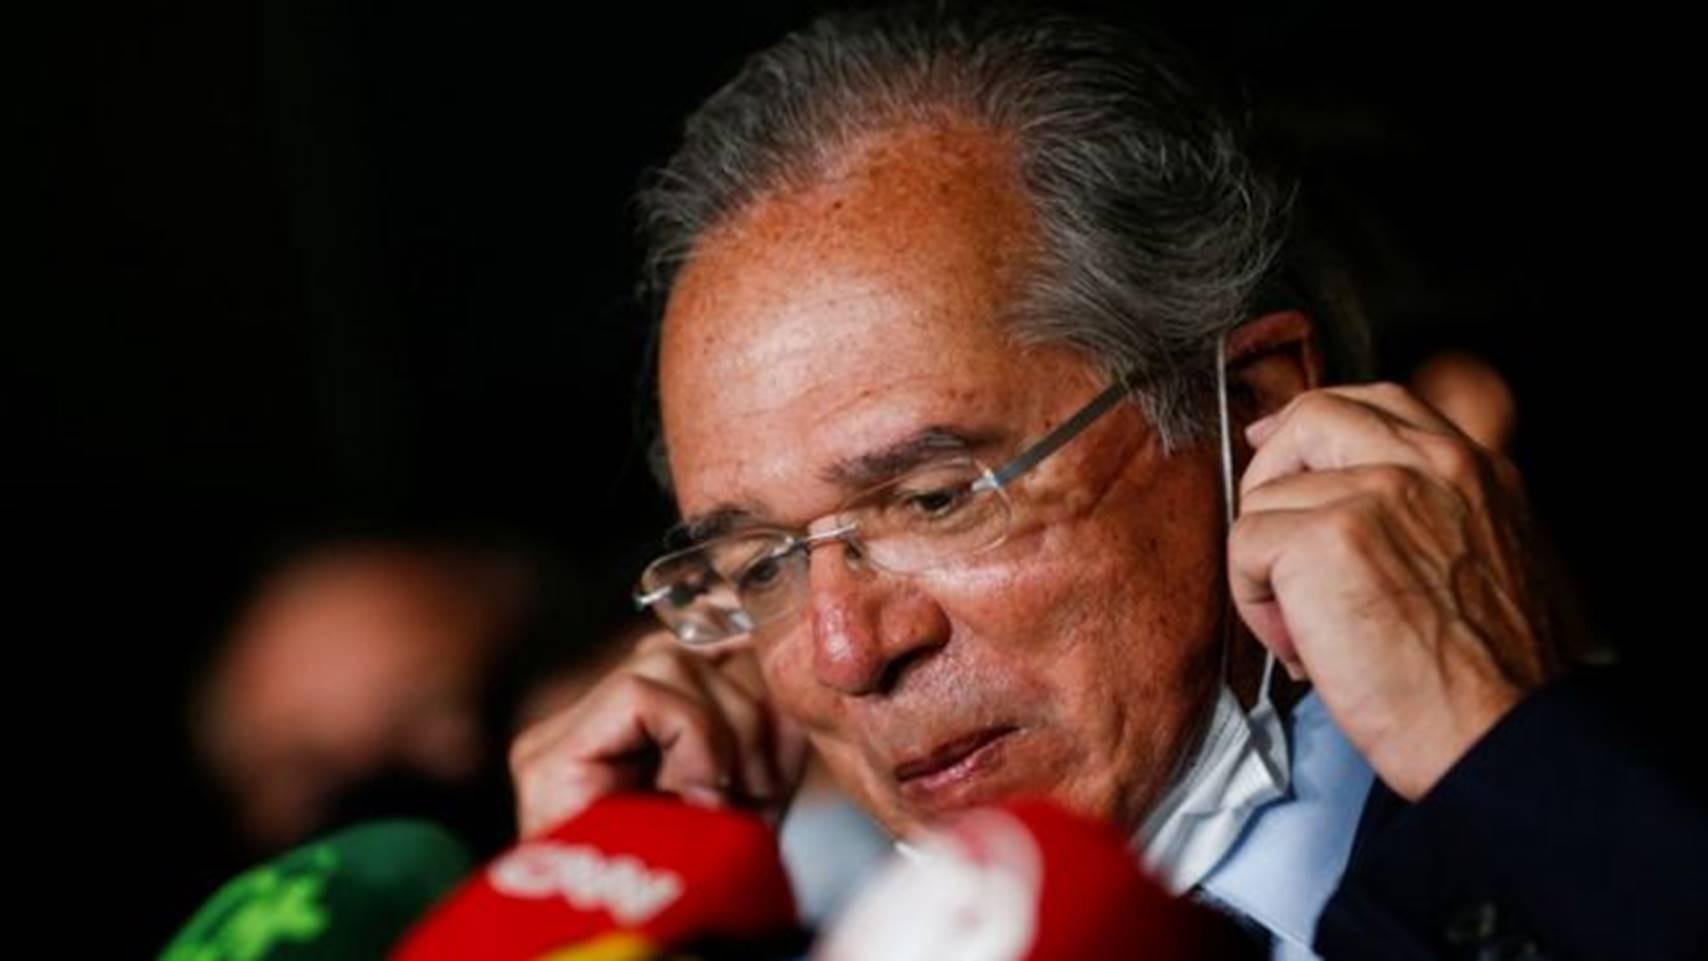 Para assessores de Bolsonaro, Guedes pode sair se governo optar por furar teto de gastos